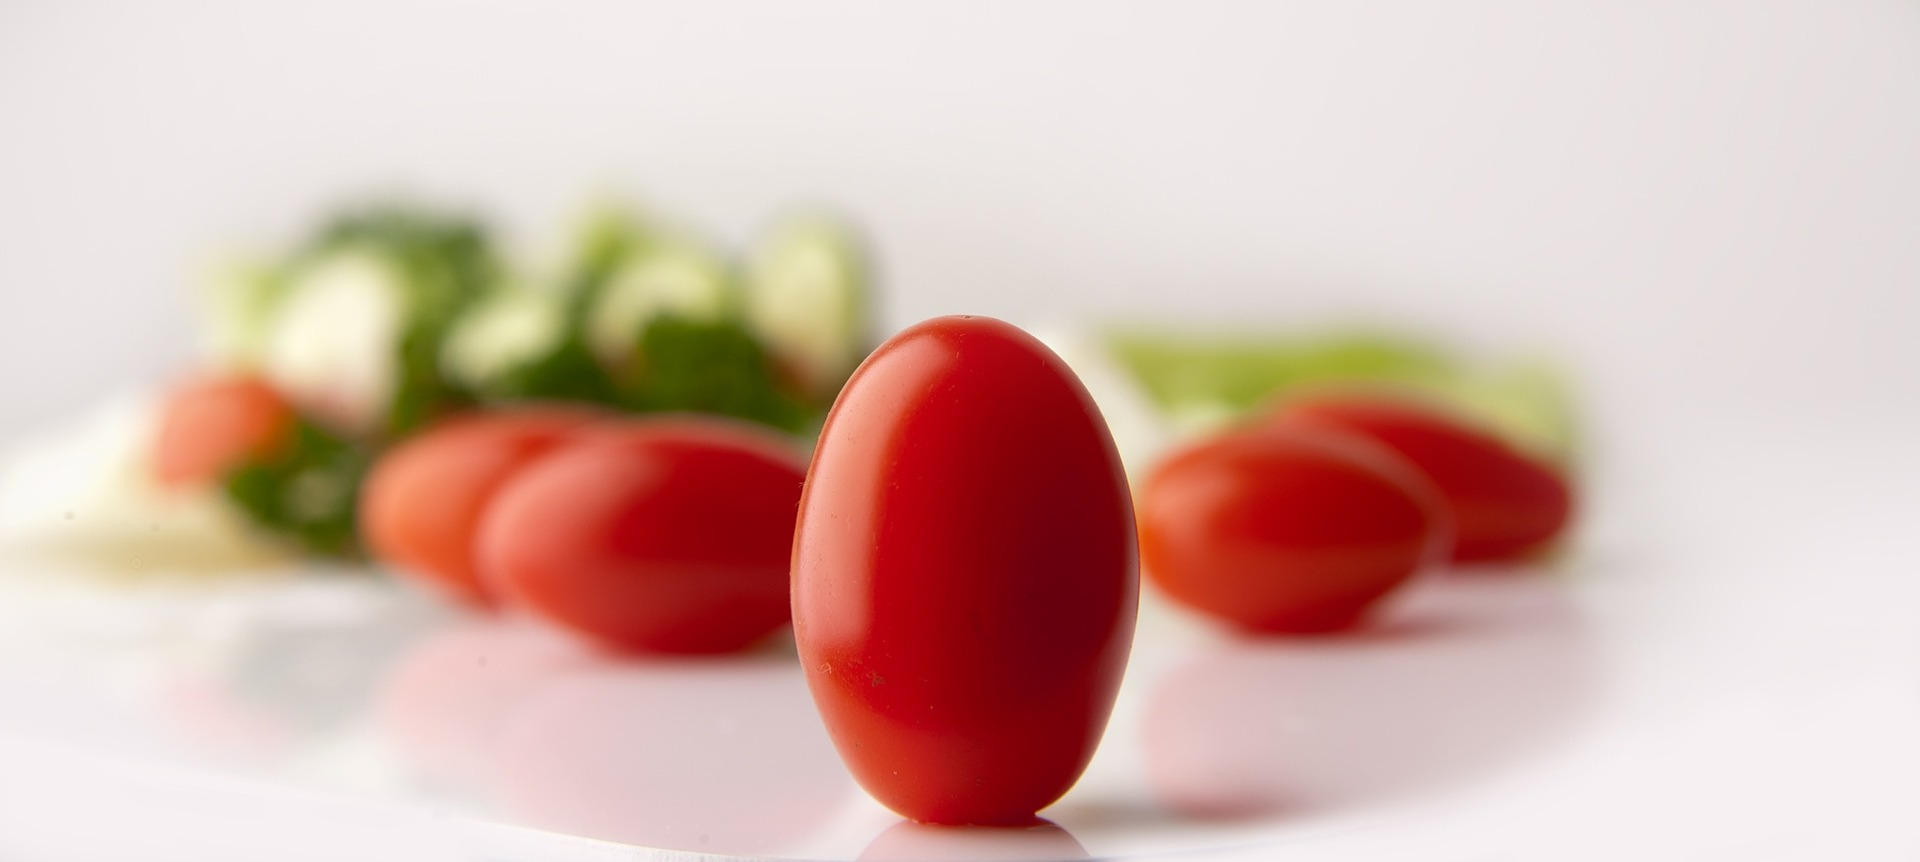 tomatoes-646645_1920